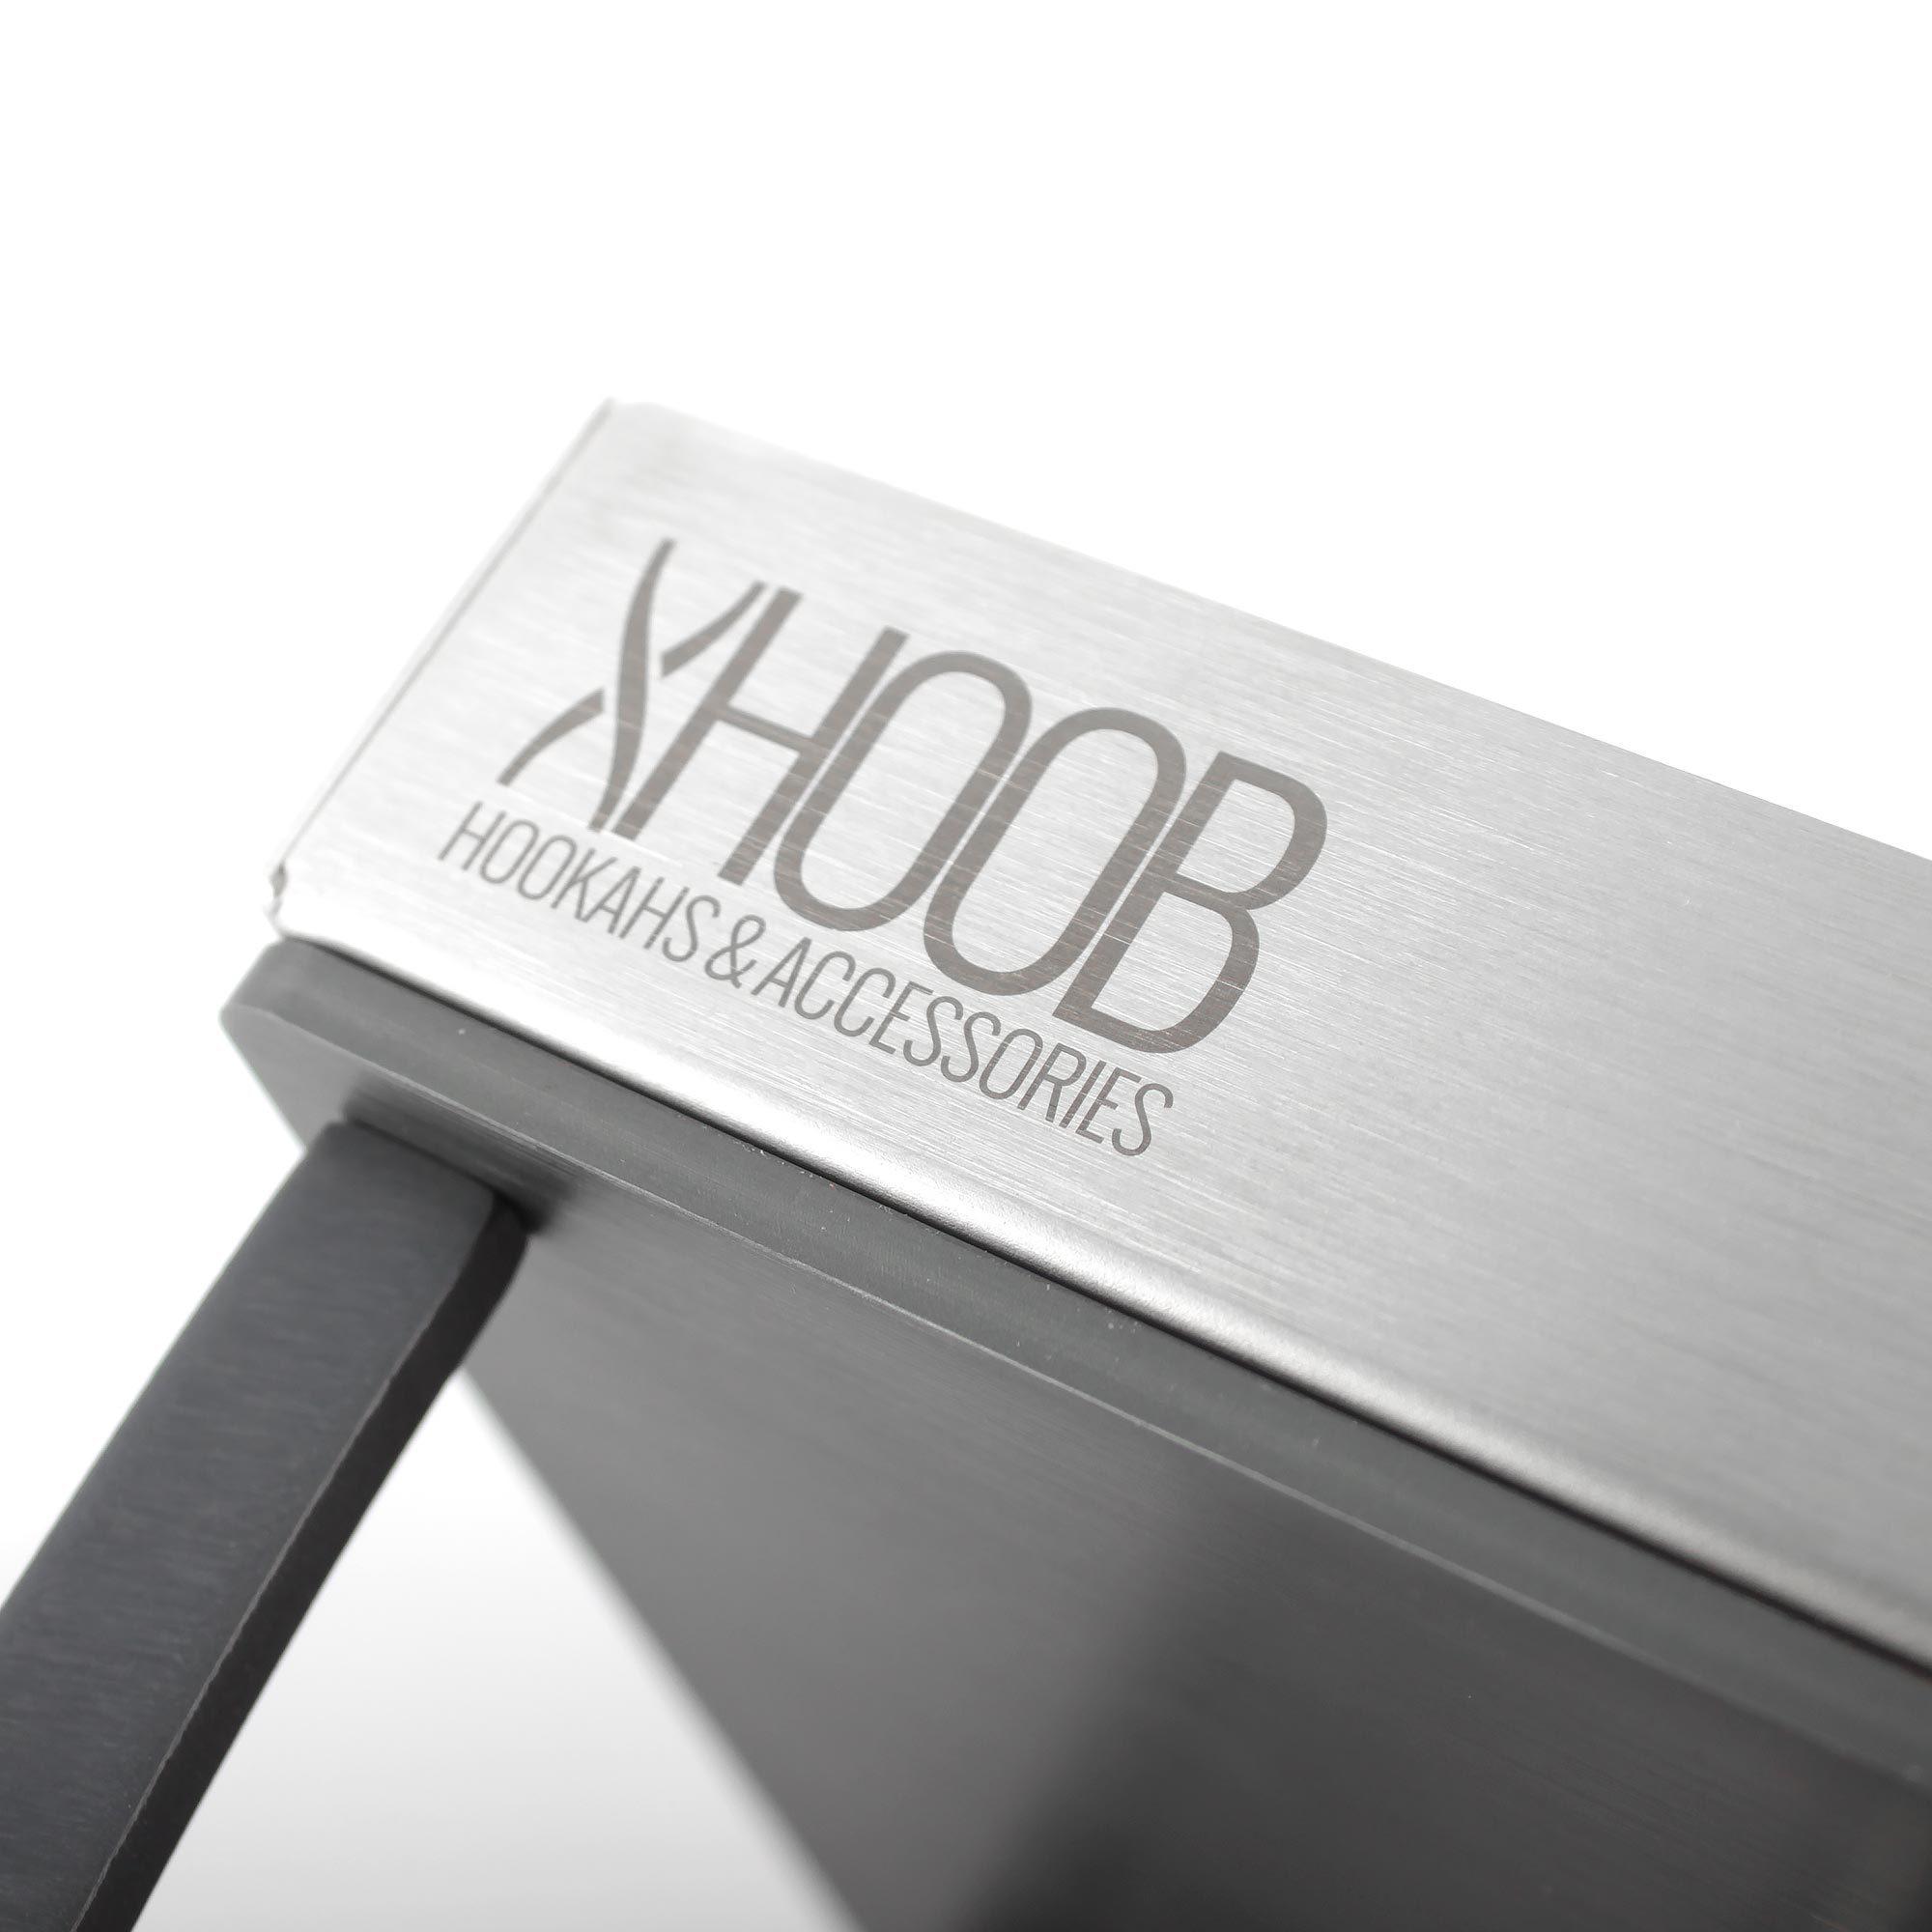 Гравировка на блюдцу XHOOB